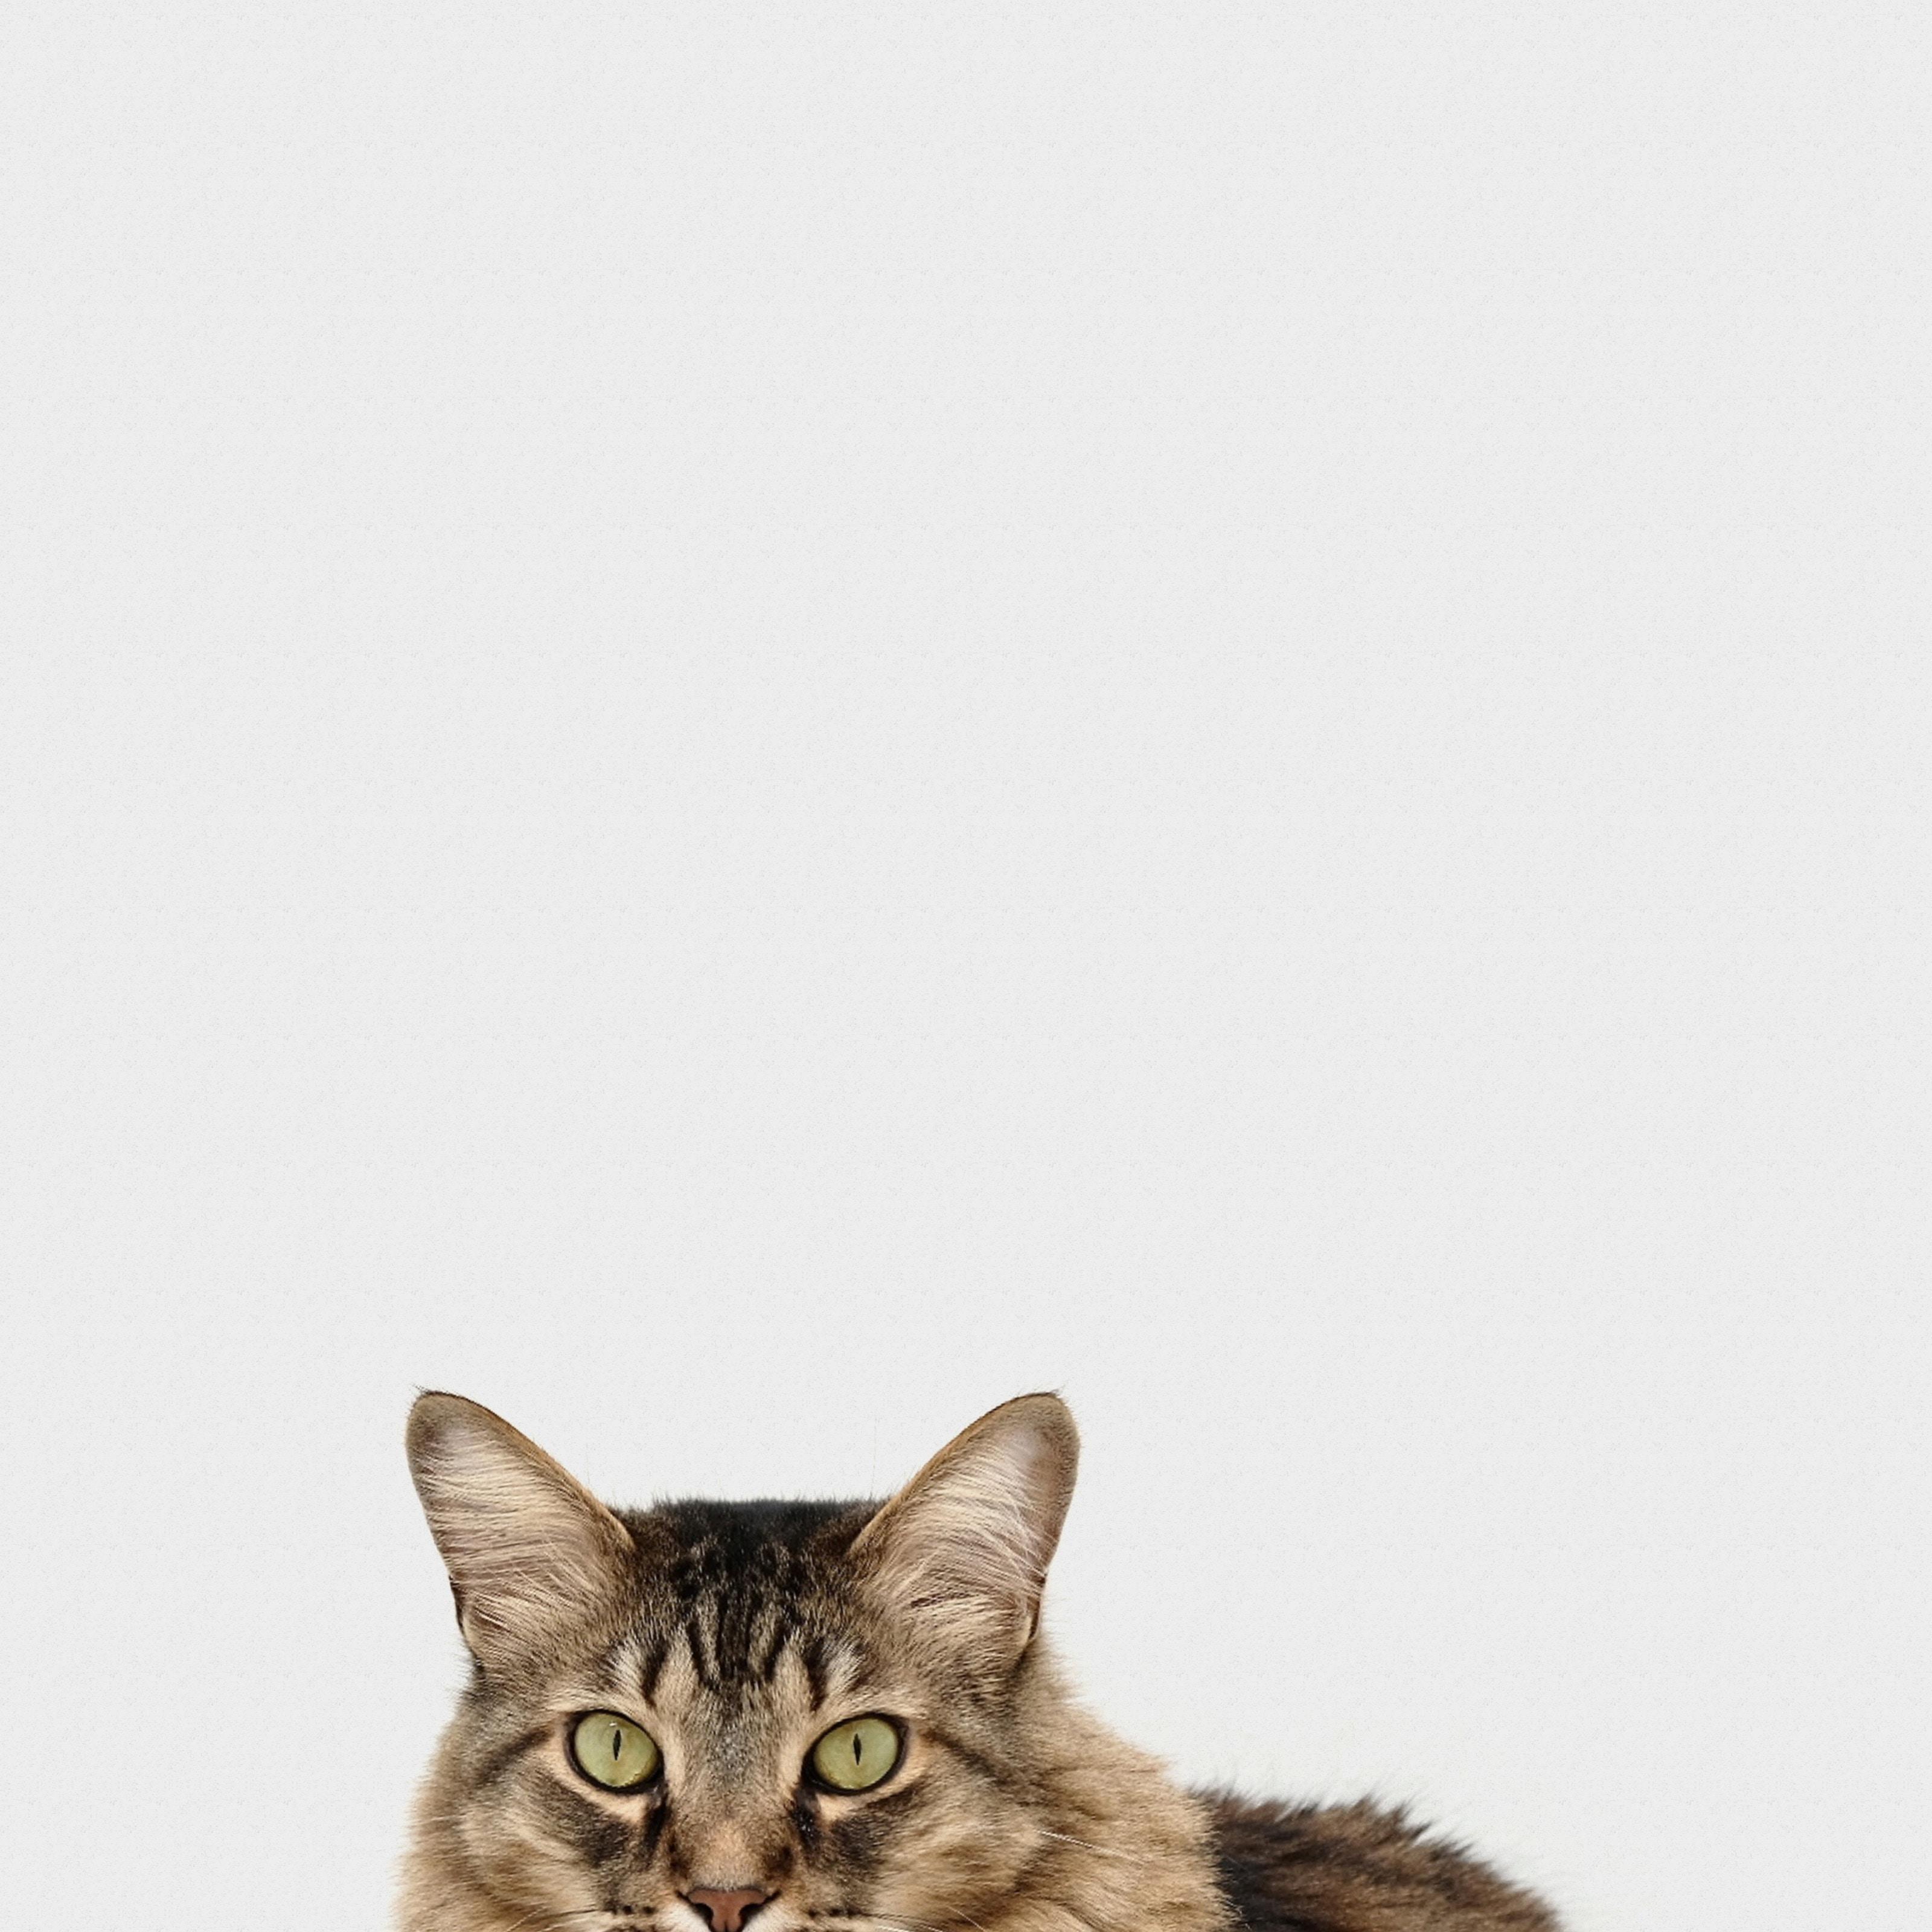 nonsense 3.0 [a cat] cat stories